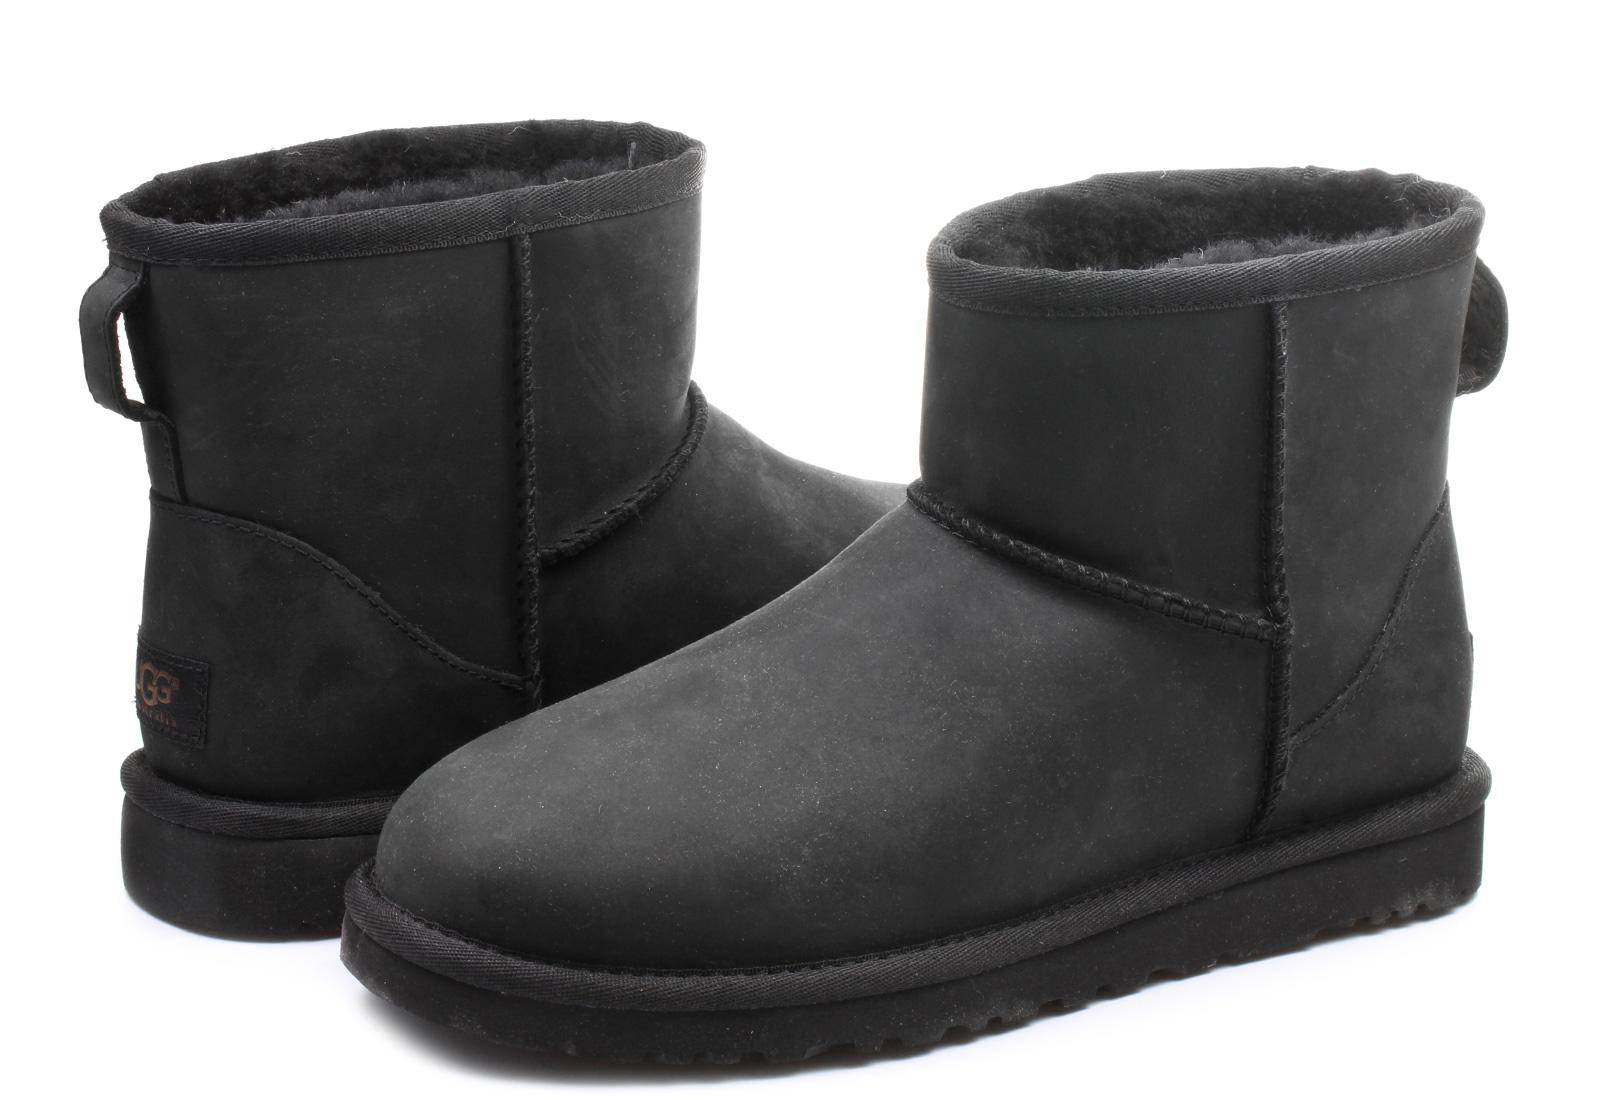 4e127e9b8aa5 Ugg Cizmy Office Shoes